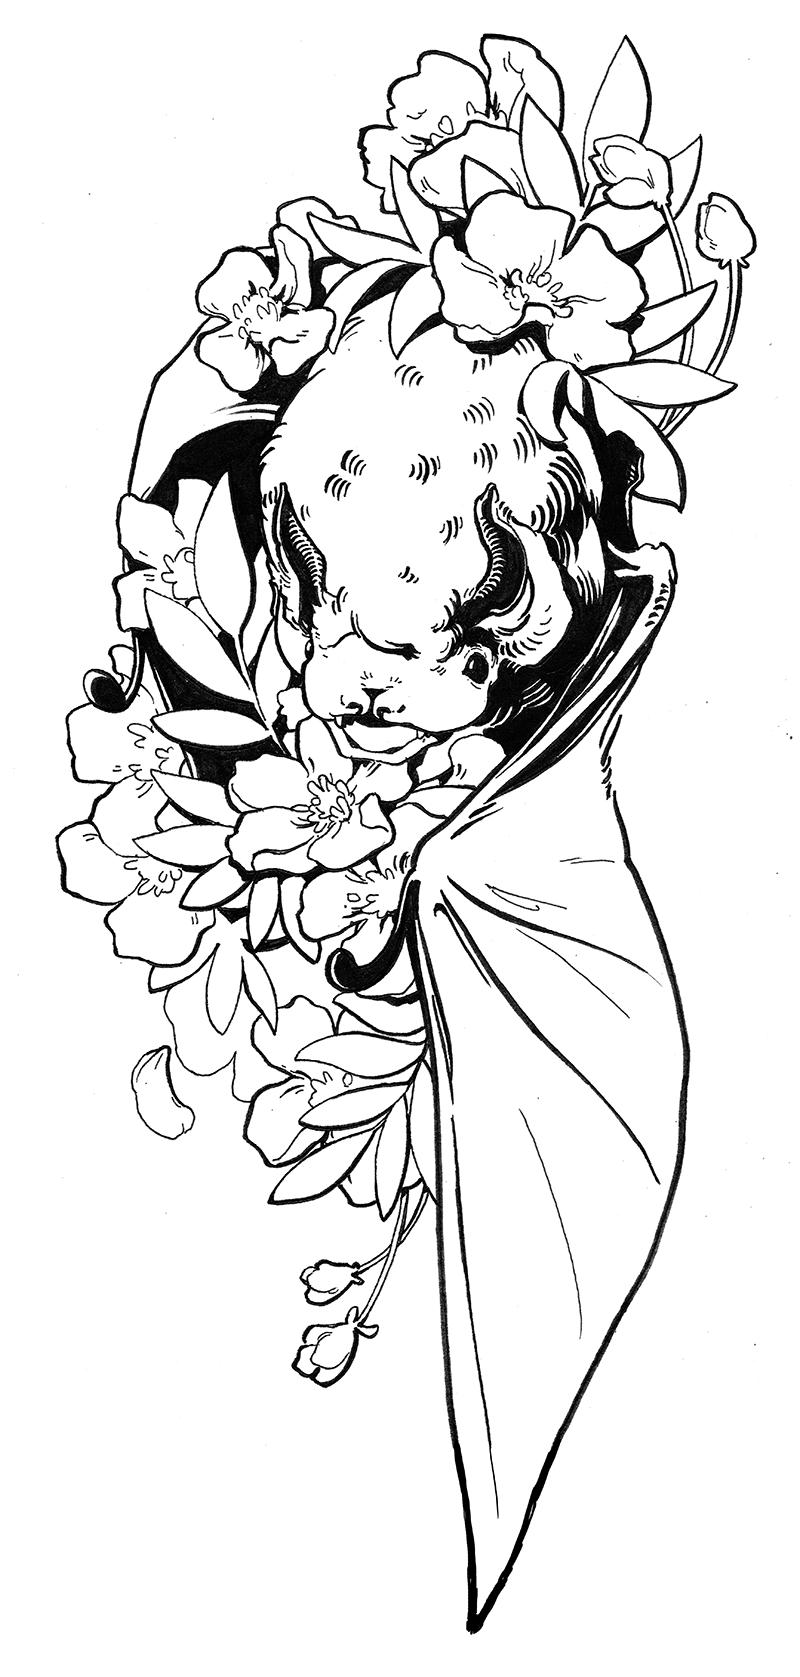 Hoary Bat & Swamp Rose